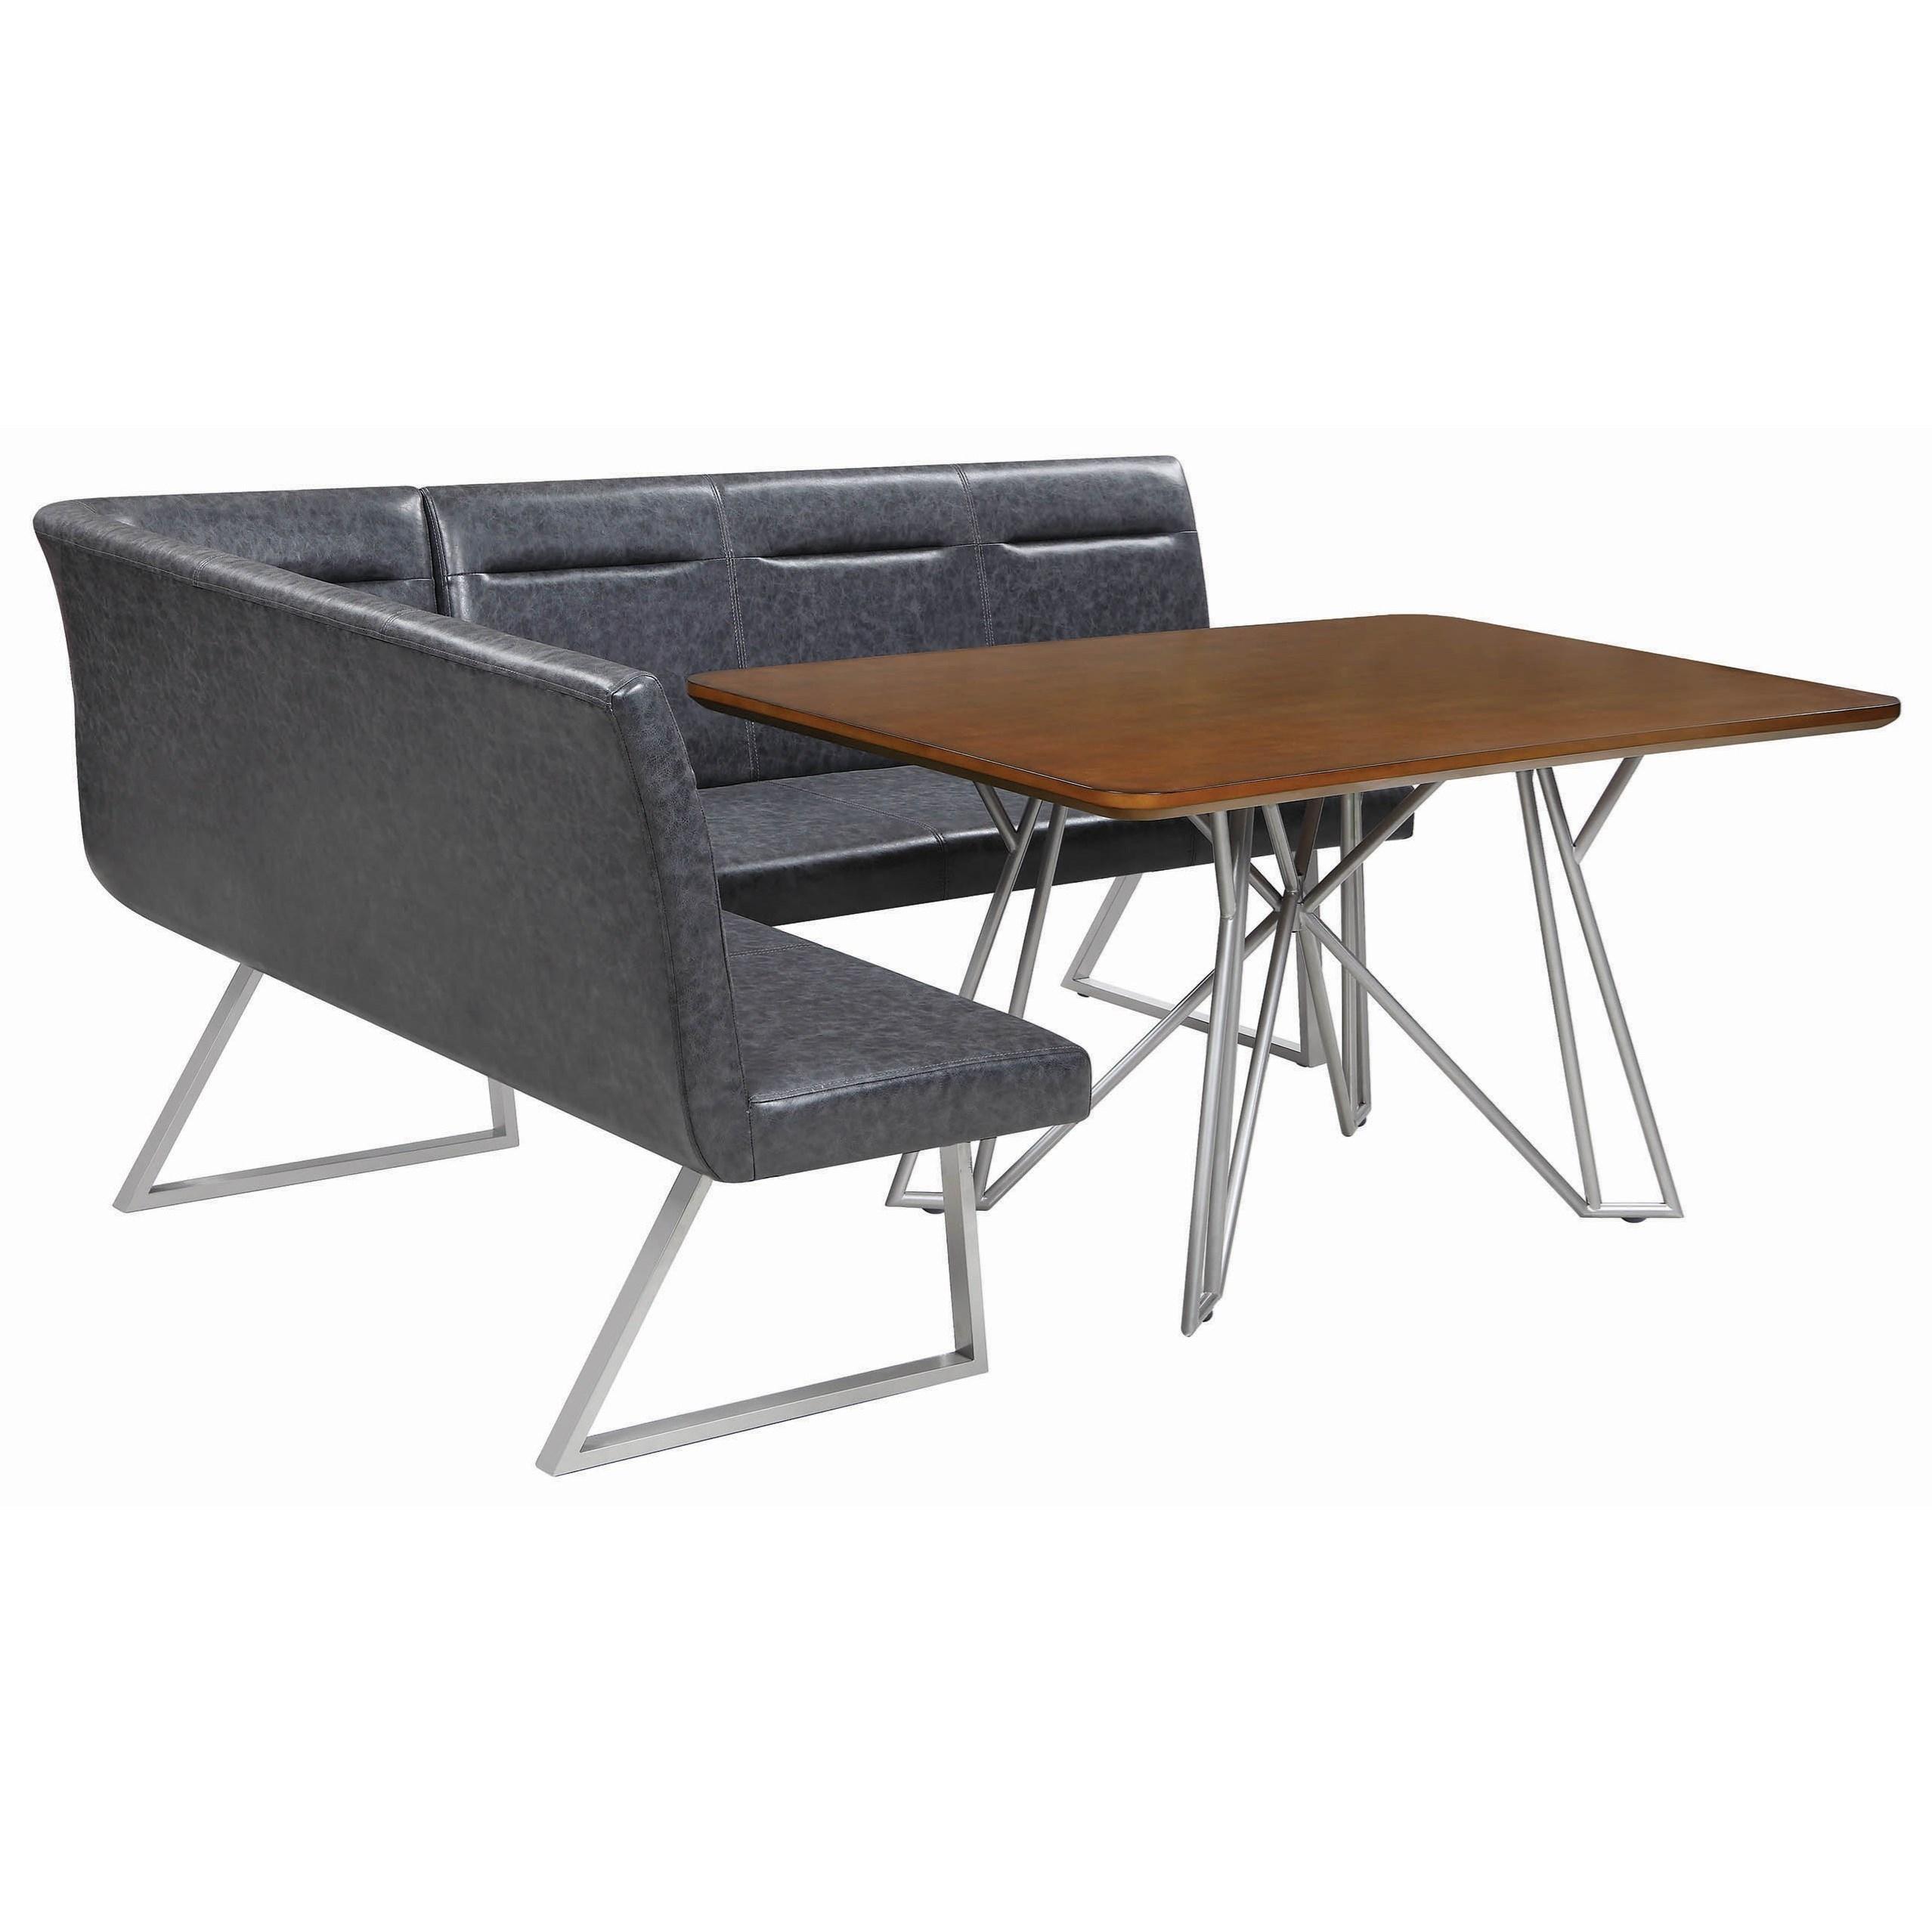 2 Pc Modular Dining Bench